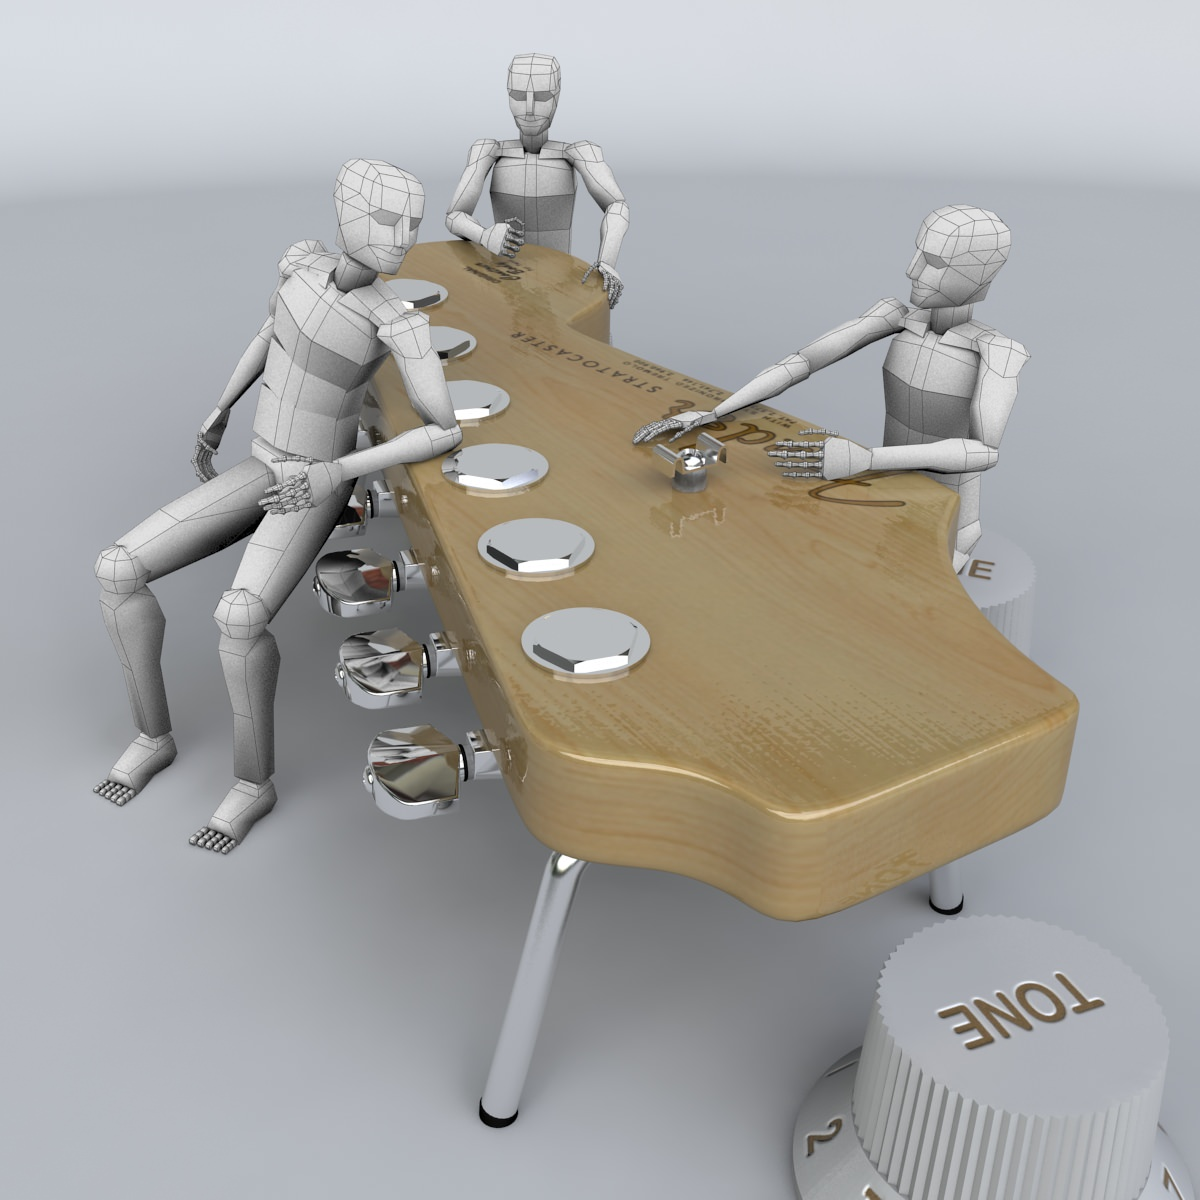 Strato shaped design table 3d model max obj 3ds fbx for Table design 3d model